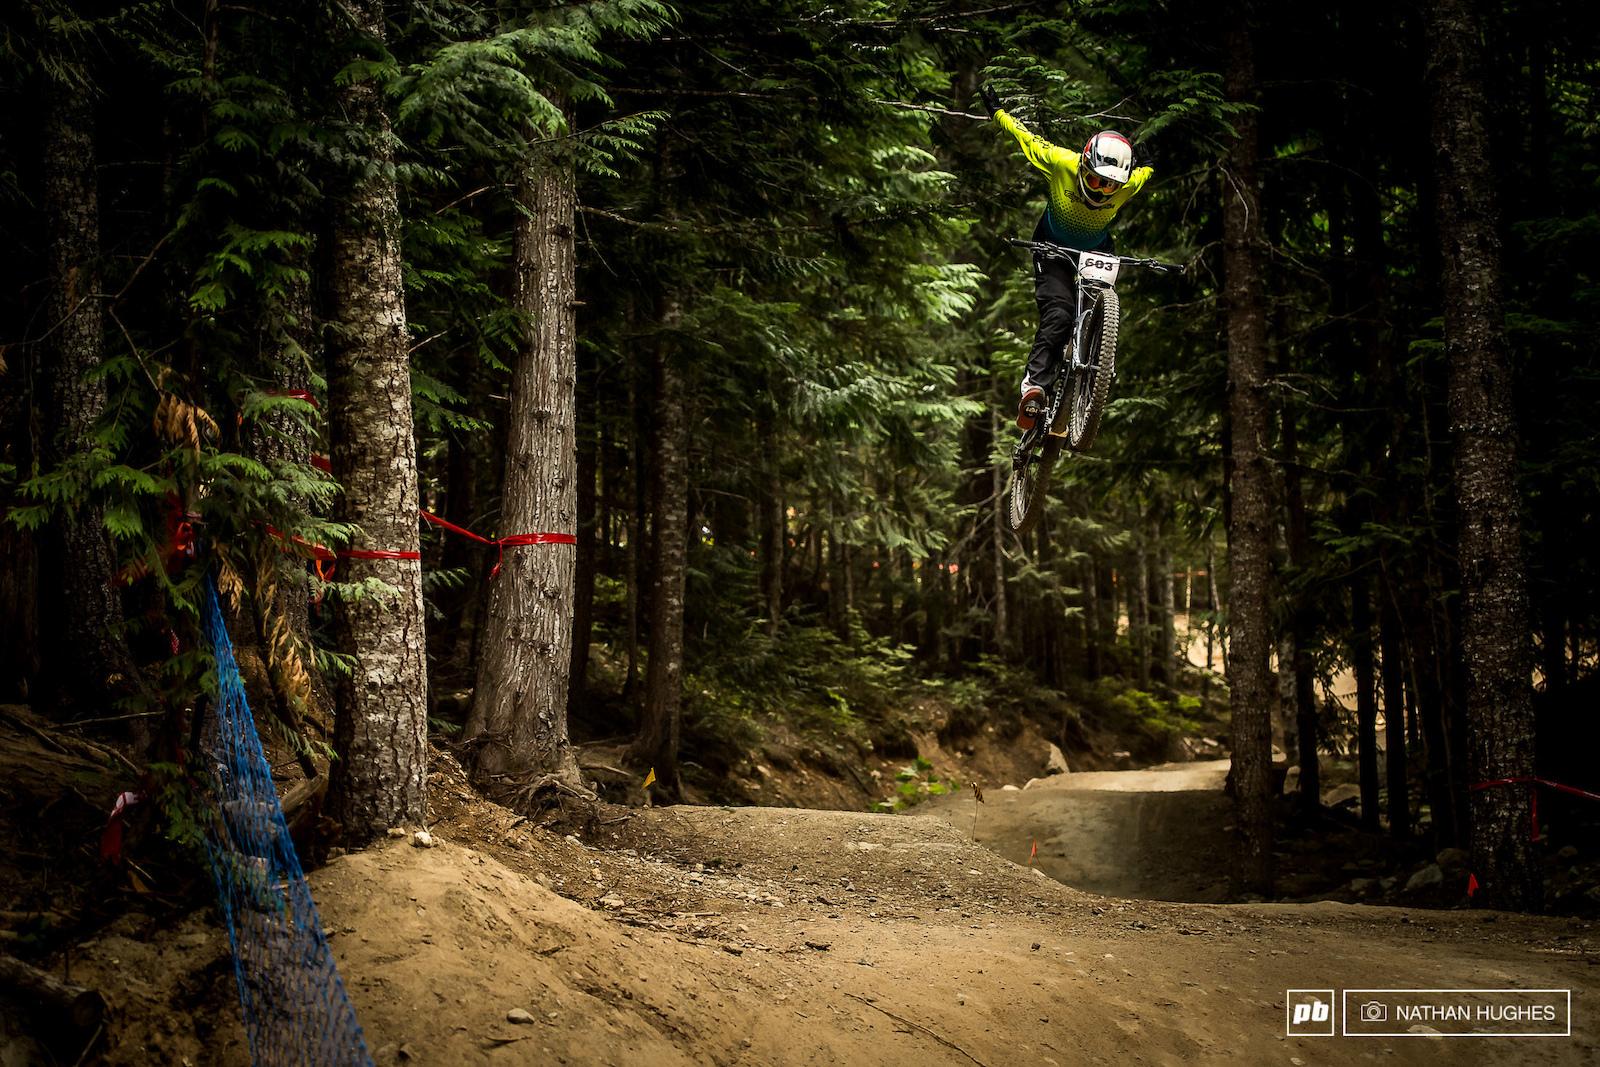 Daniel Gomez Serran from Madrid riding free.